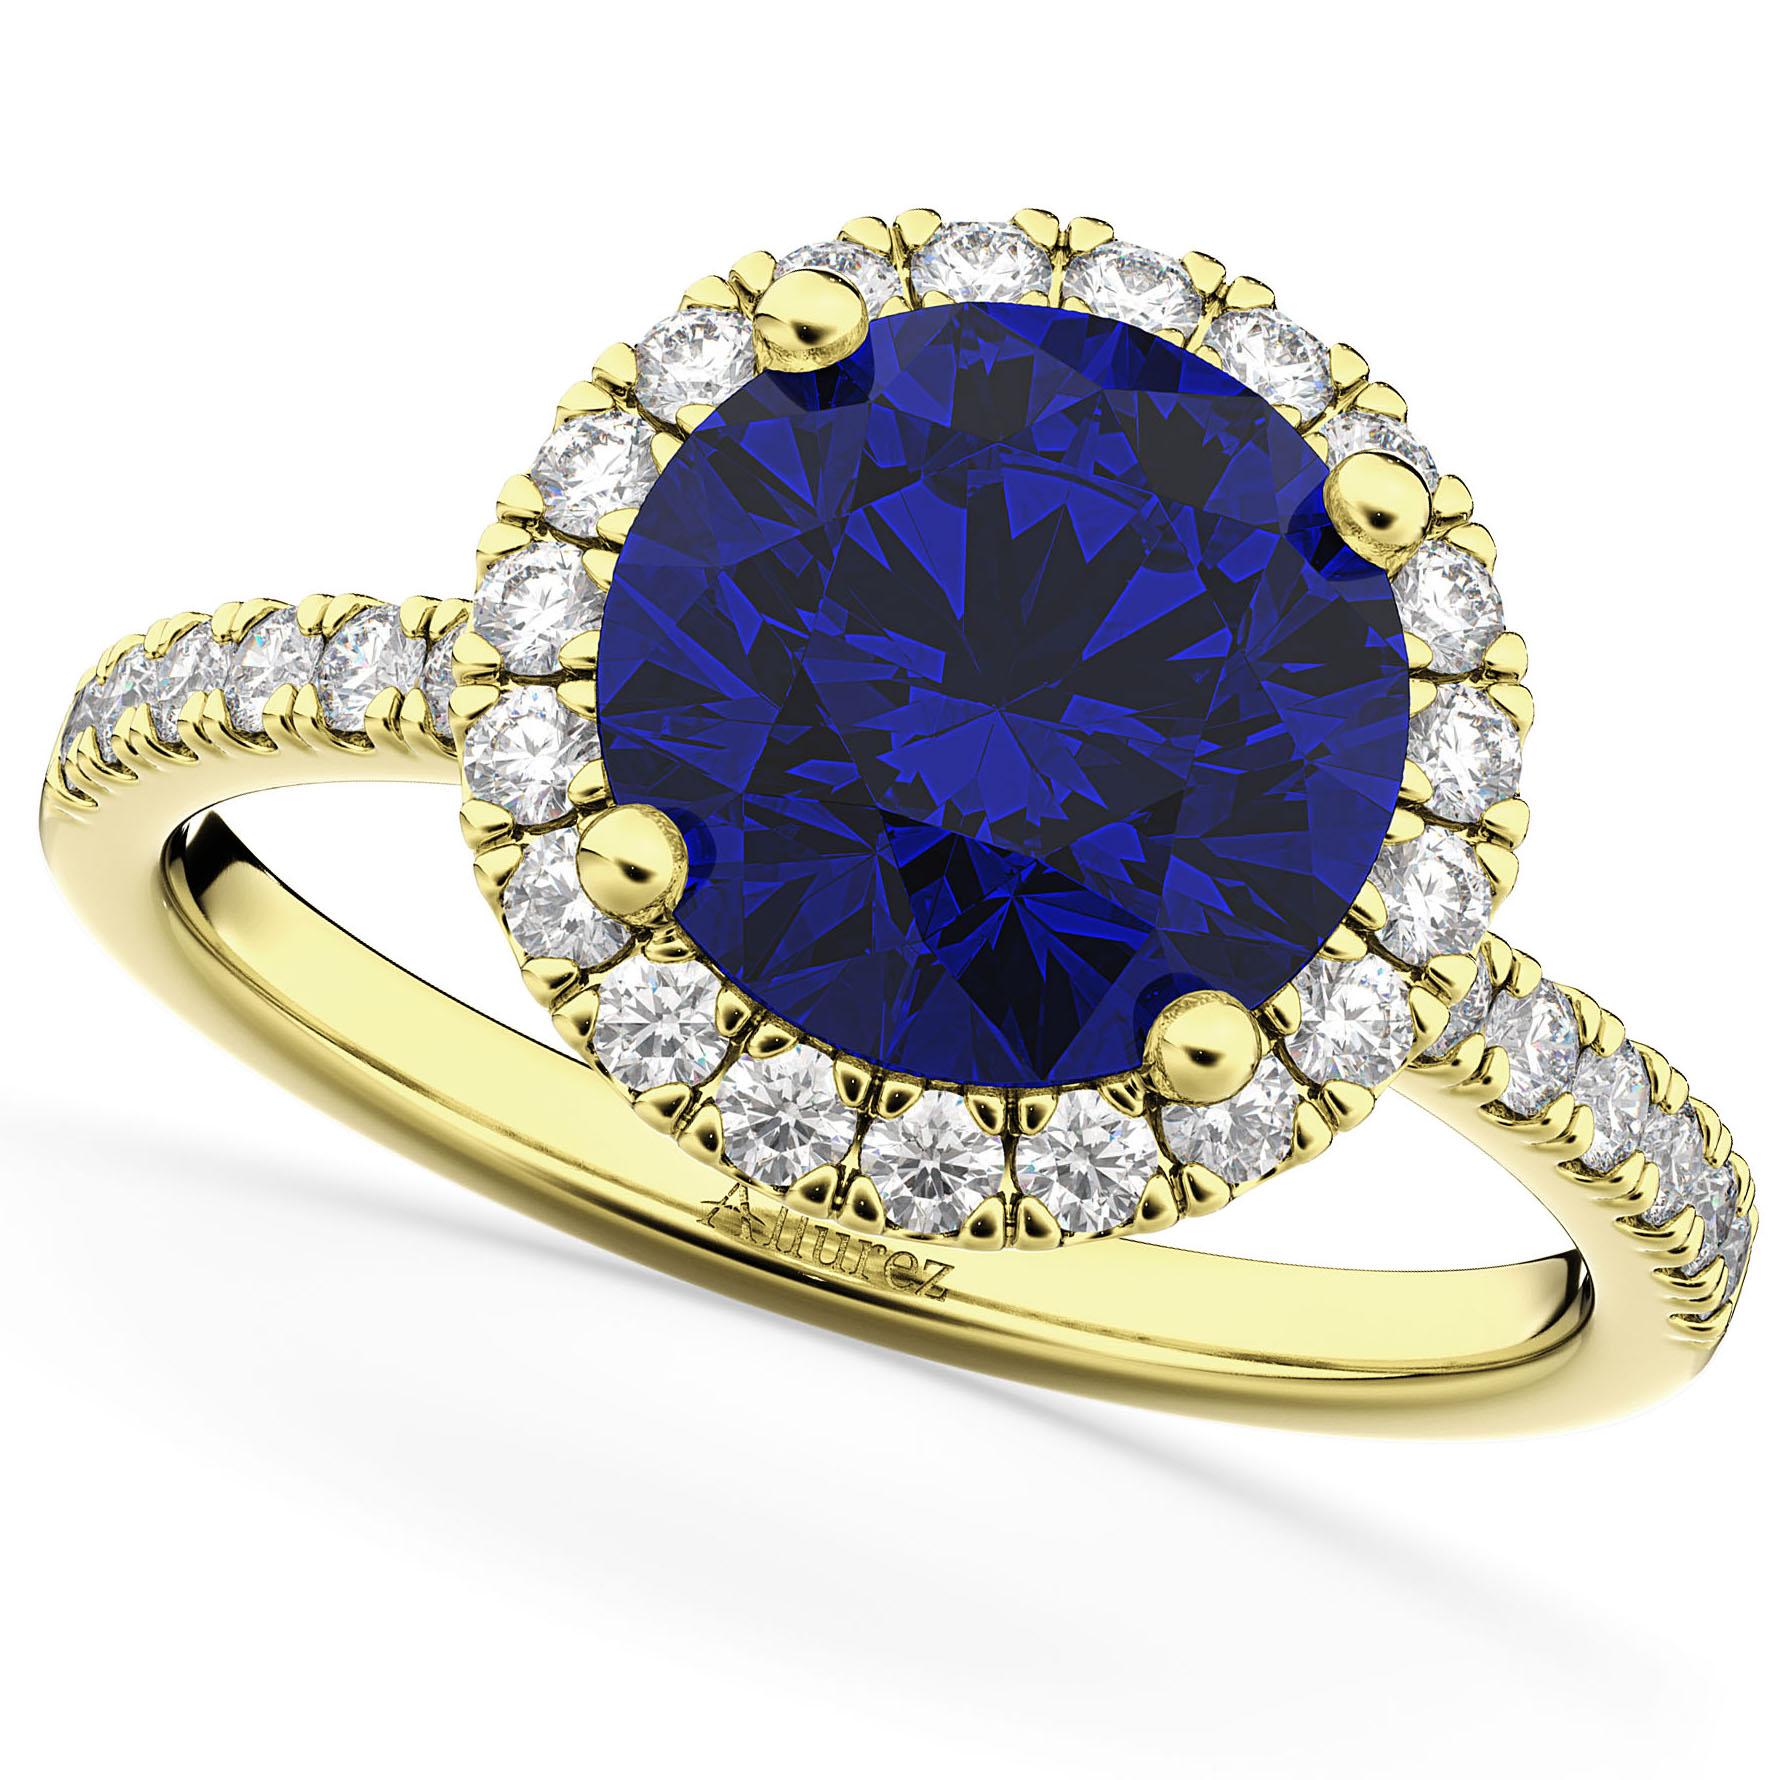 Halo Blue Sapphire & Diamond Engagement Ring 14K Yellow Gold 2.80ct